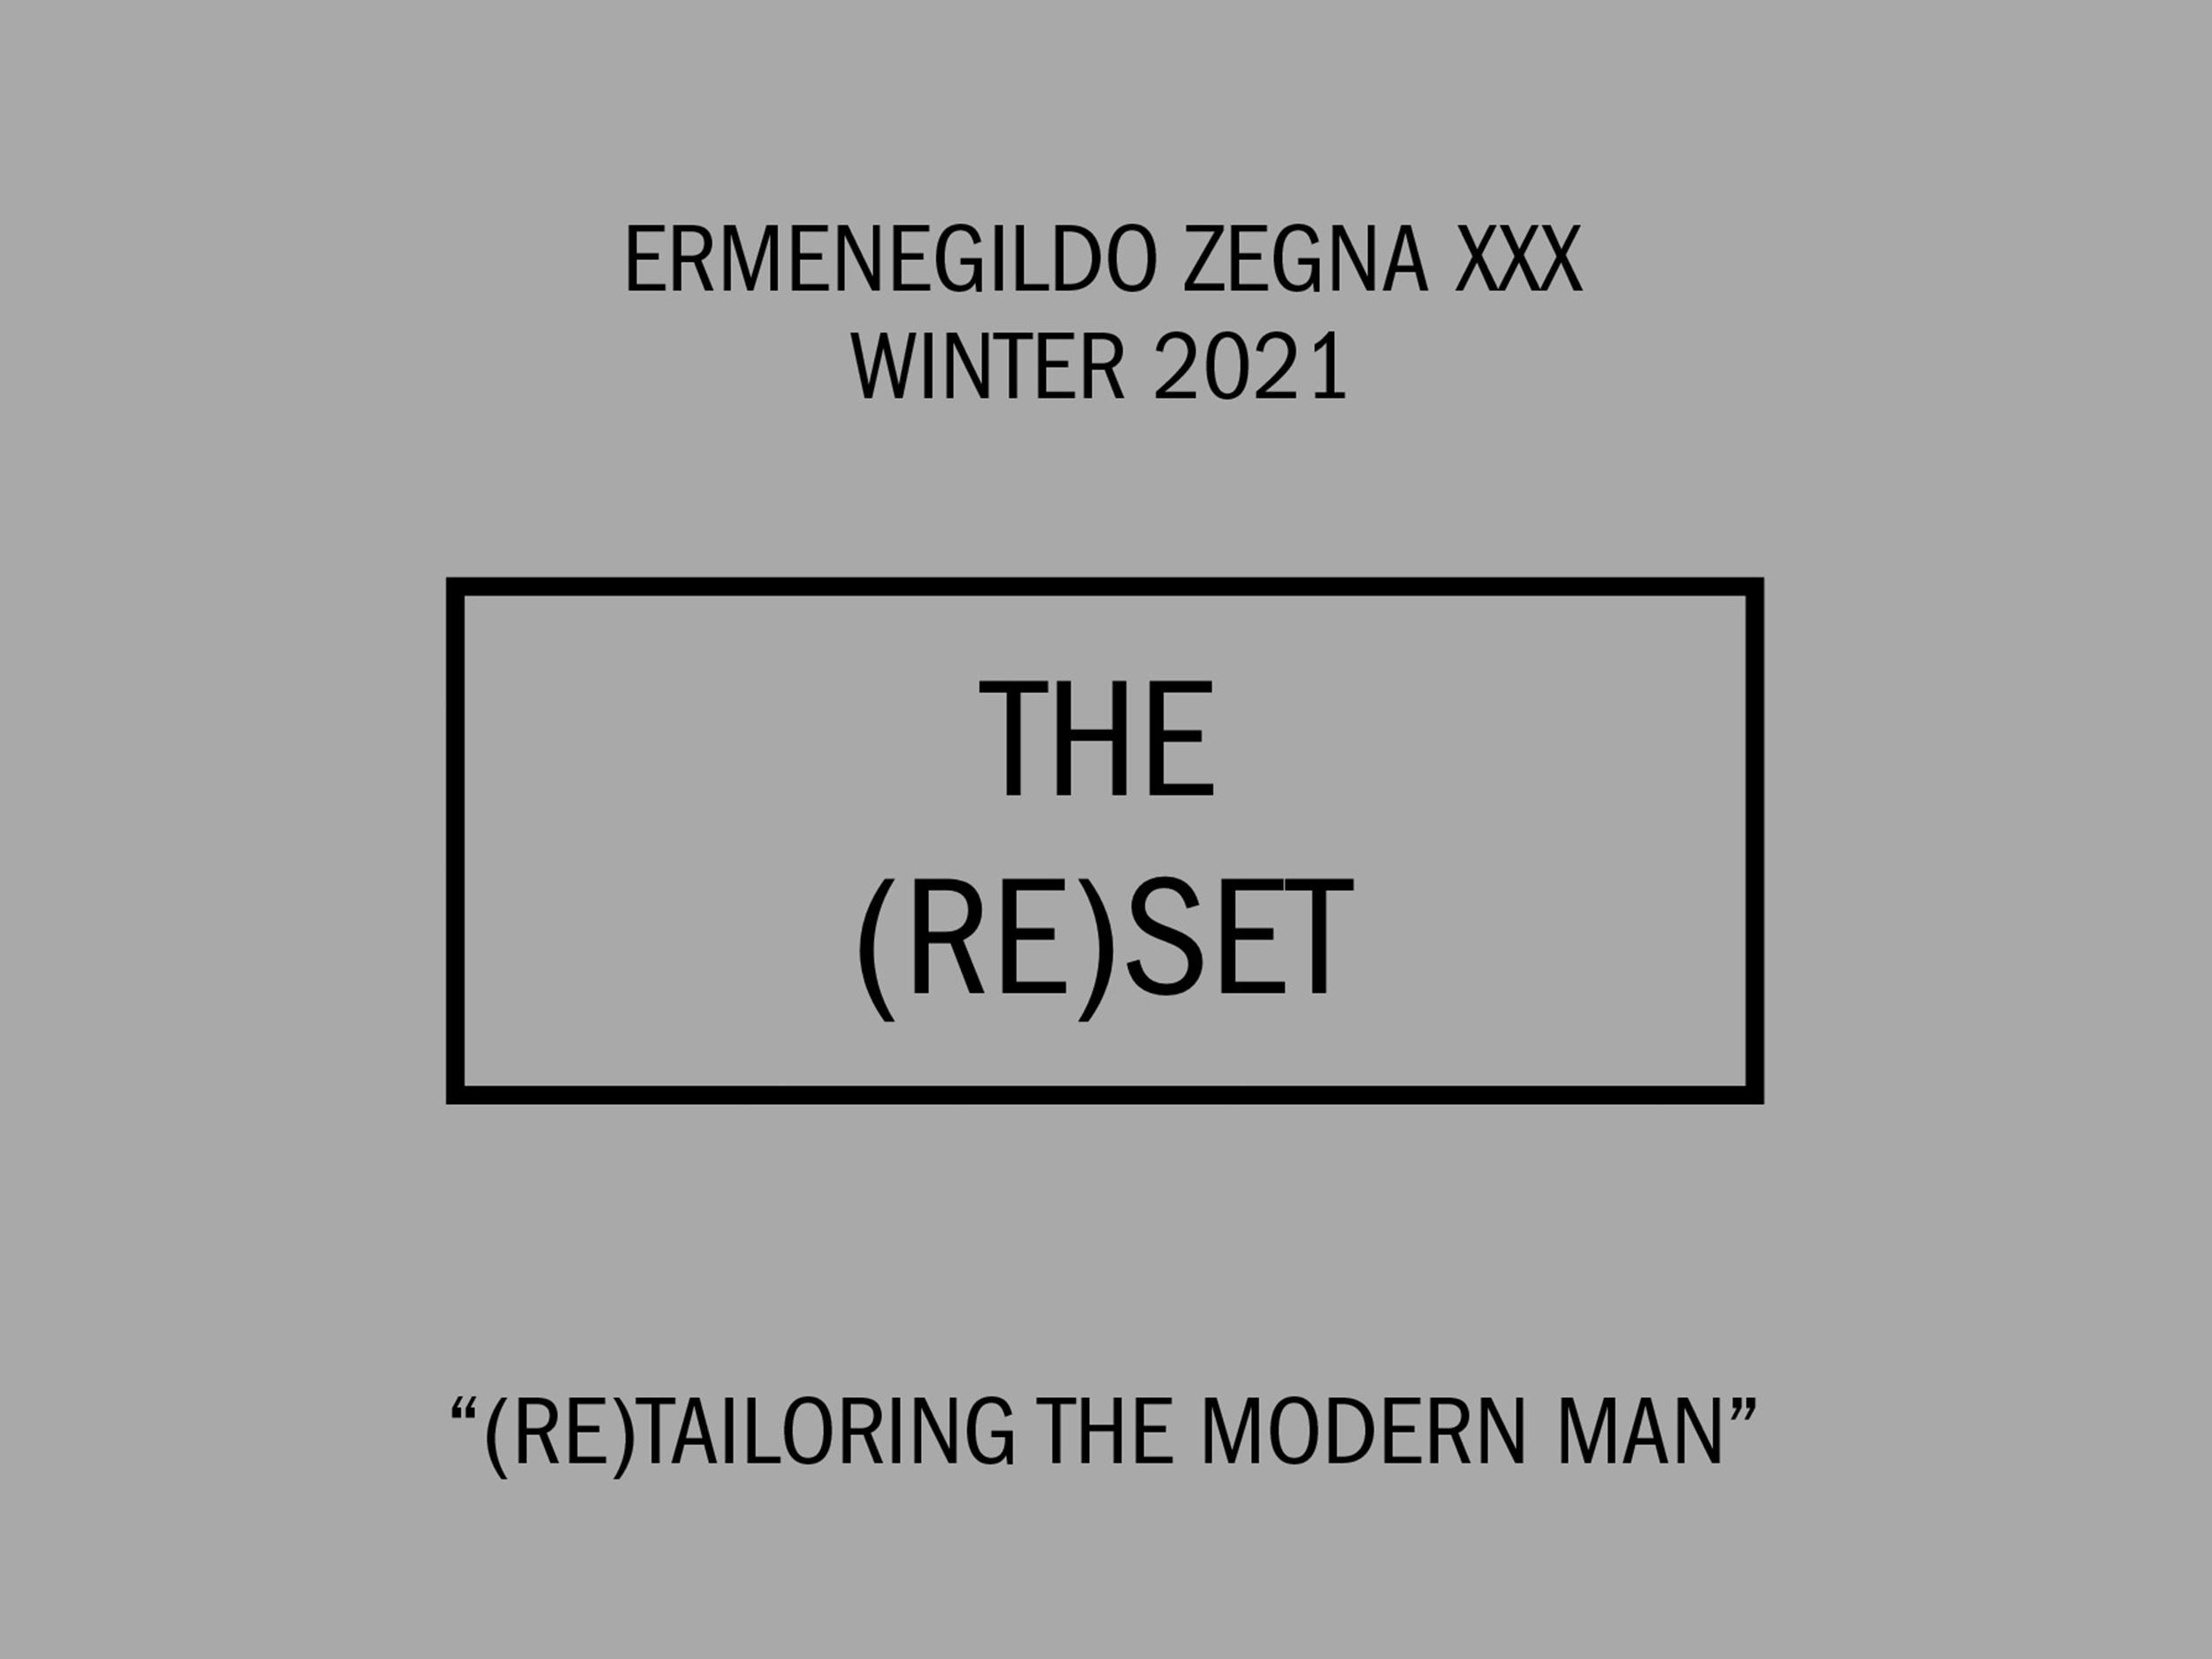 Livestream Ermenegildo Zegna XXX's Fall/Winter 2021 collection here